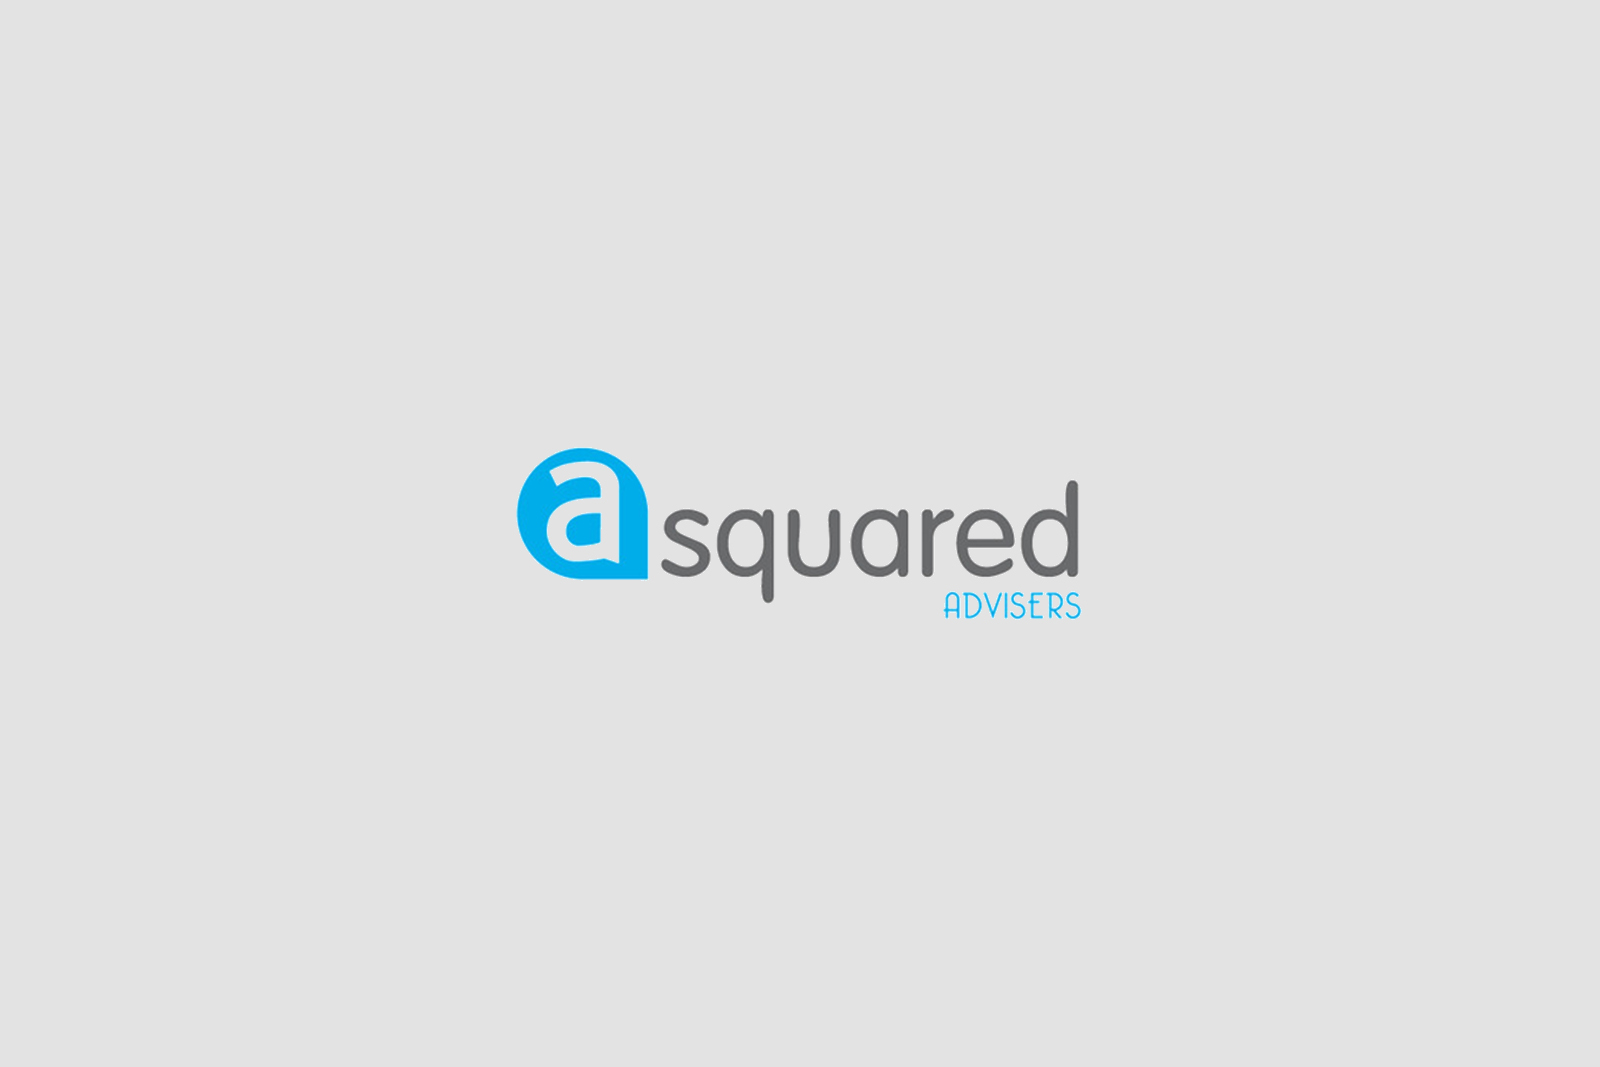 a squared.jpg